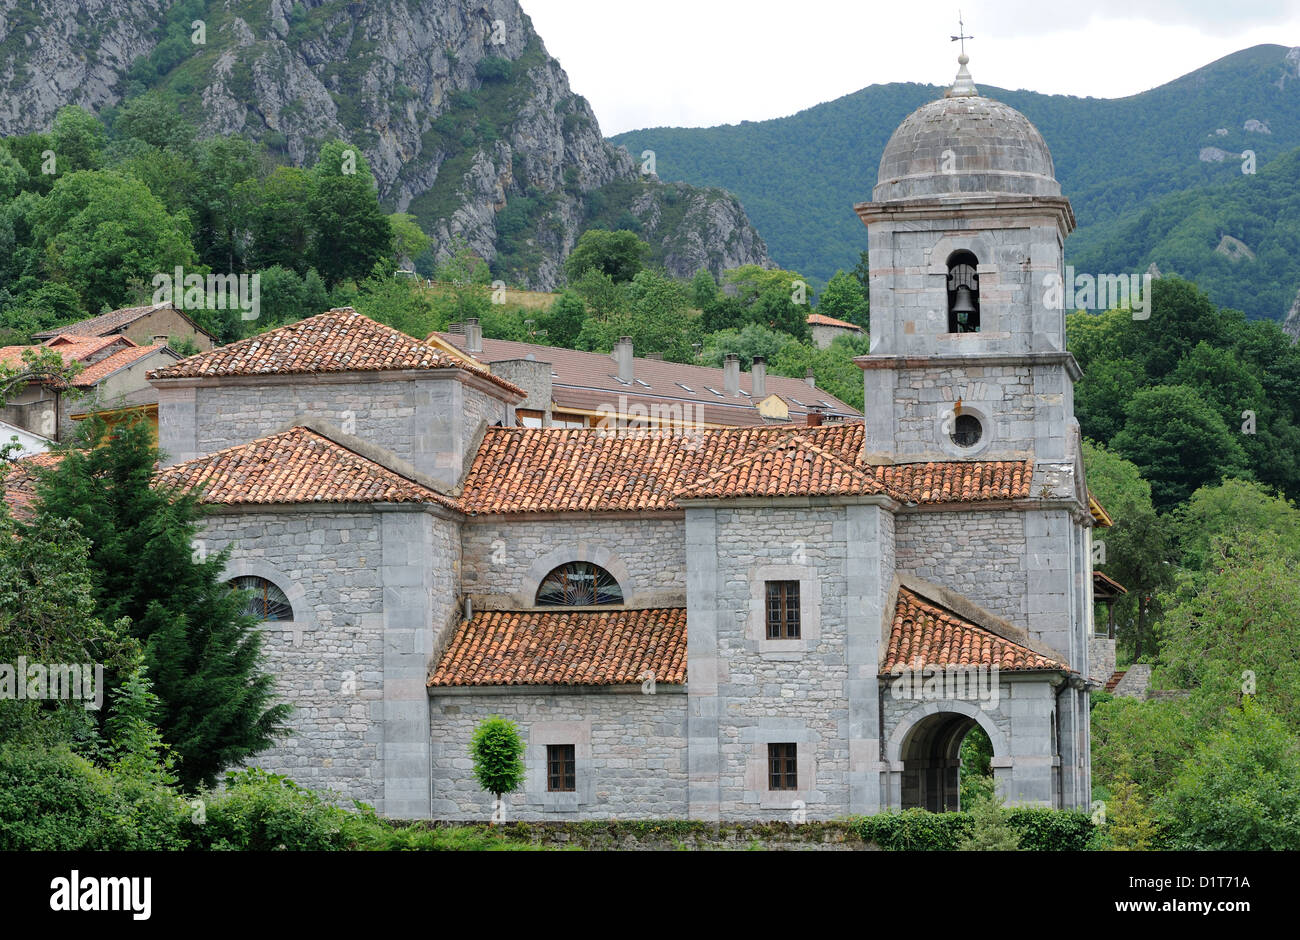 Romanesque building near Potes. Potes, Picos de Europa Asturias, Spain. - Stock Image